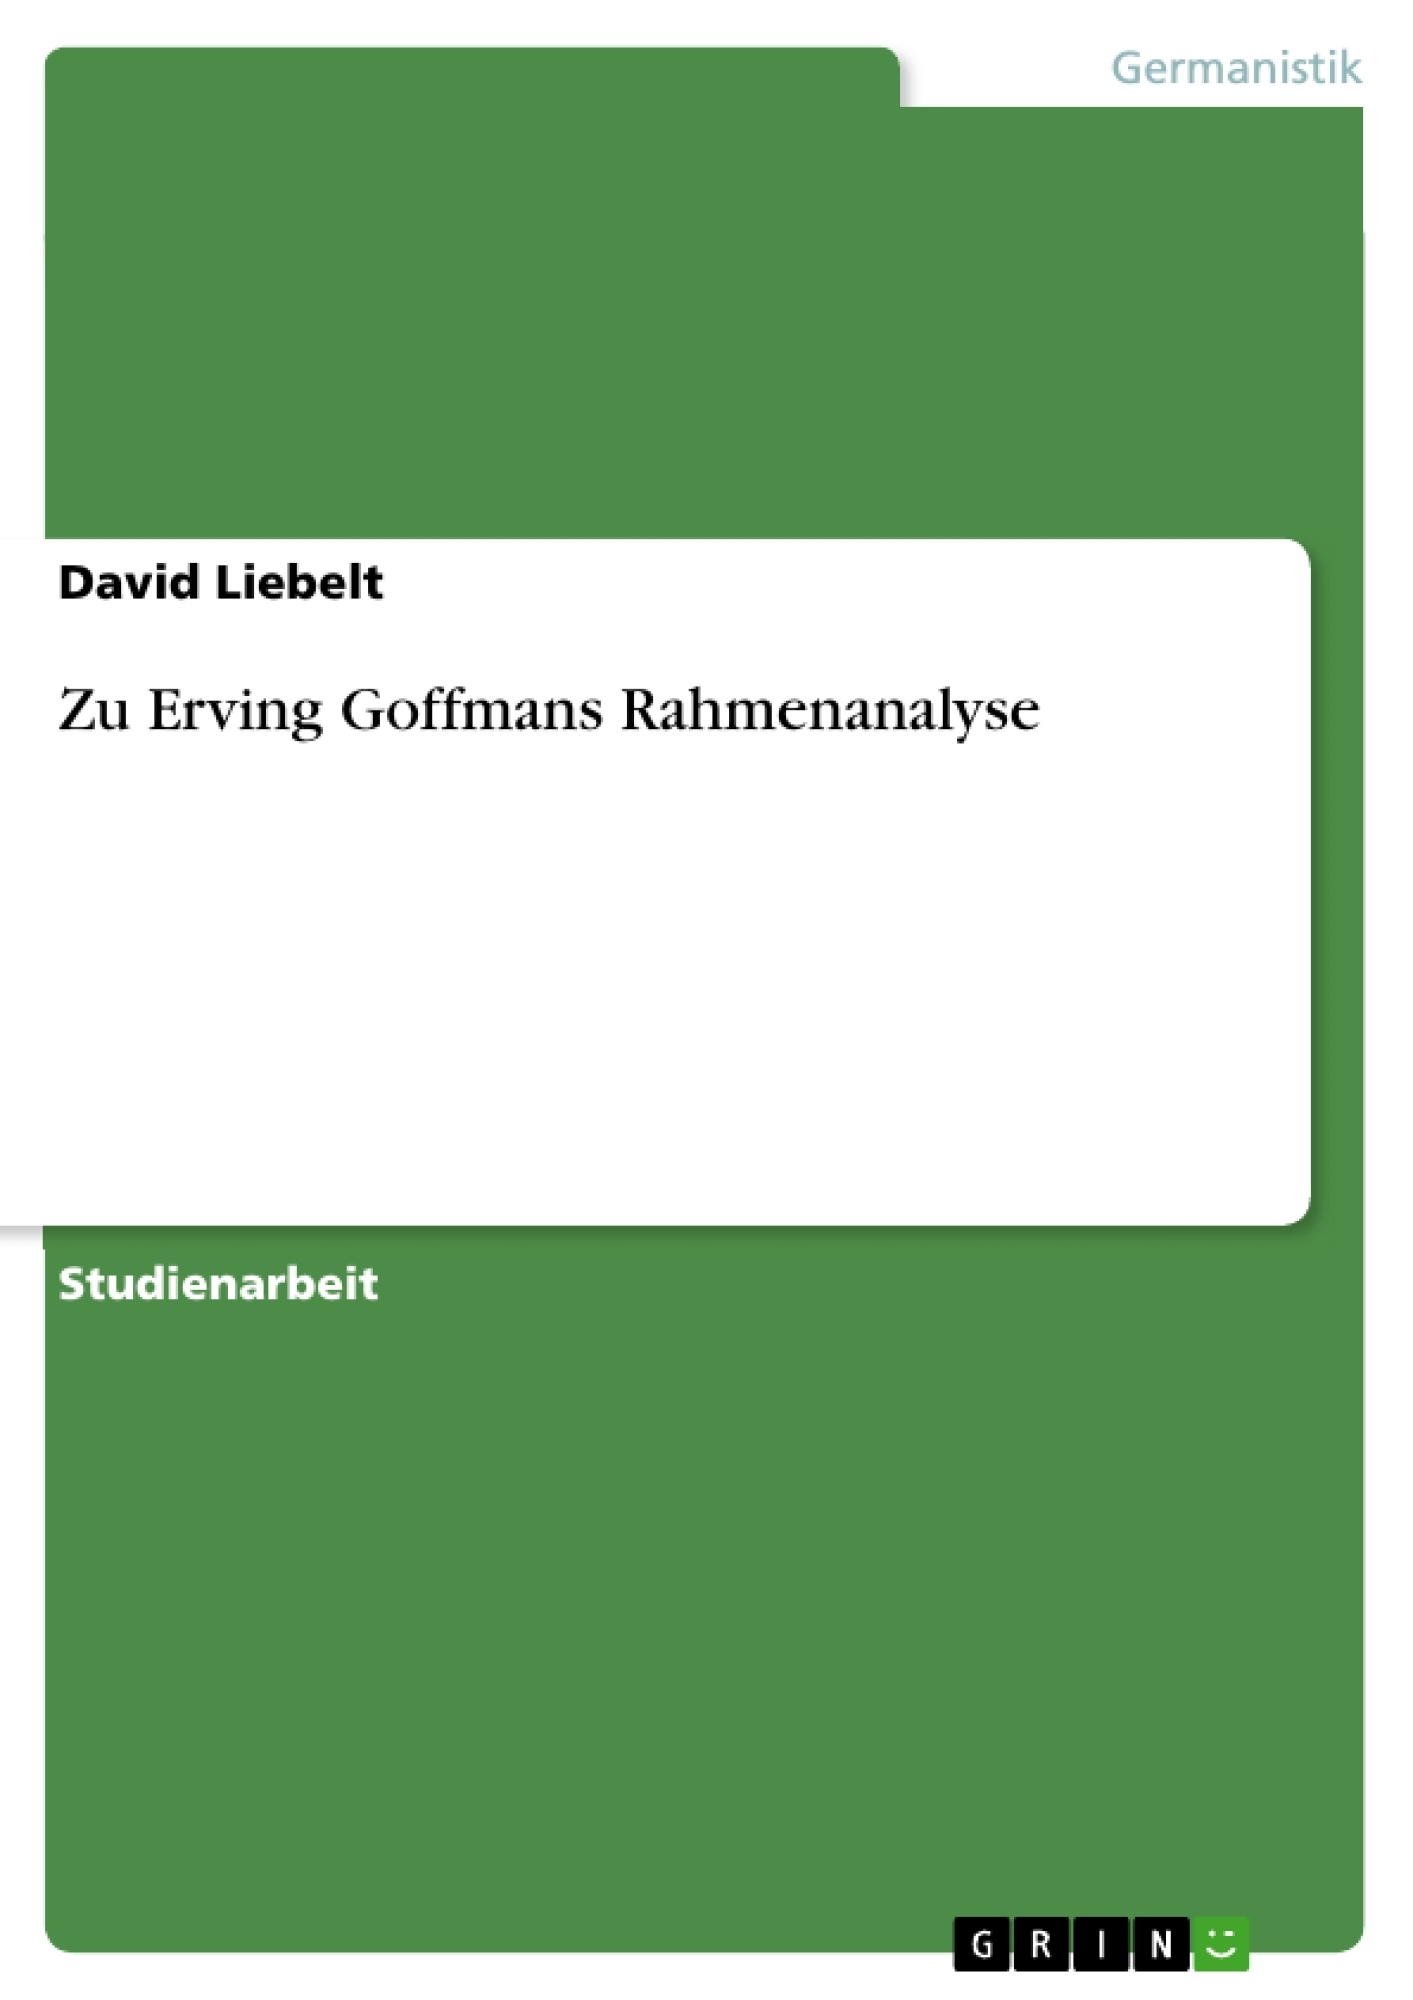 Titel: Zu Erving Goffmans Rahmenanalyse